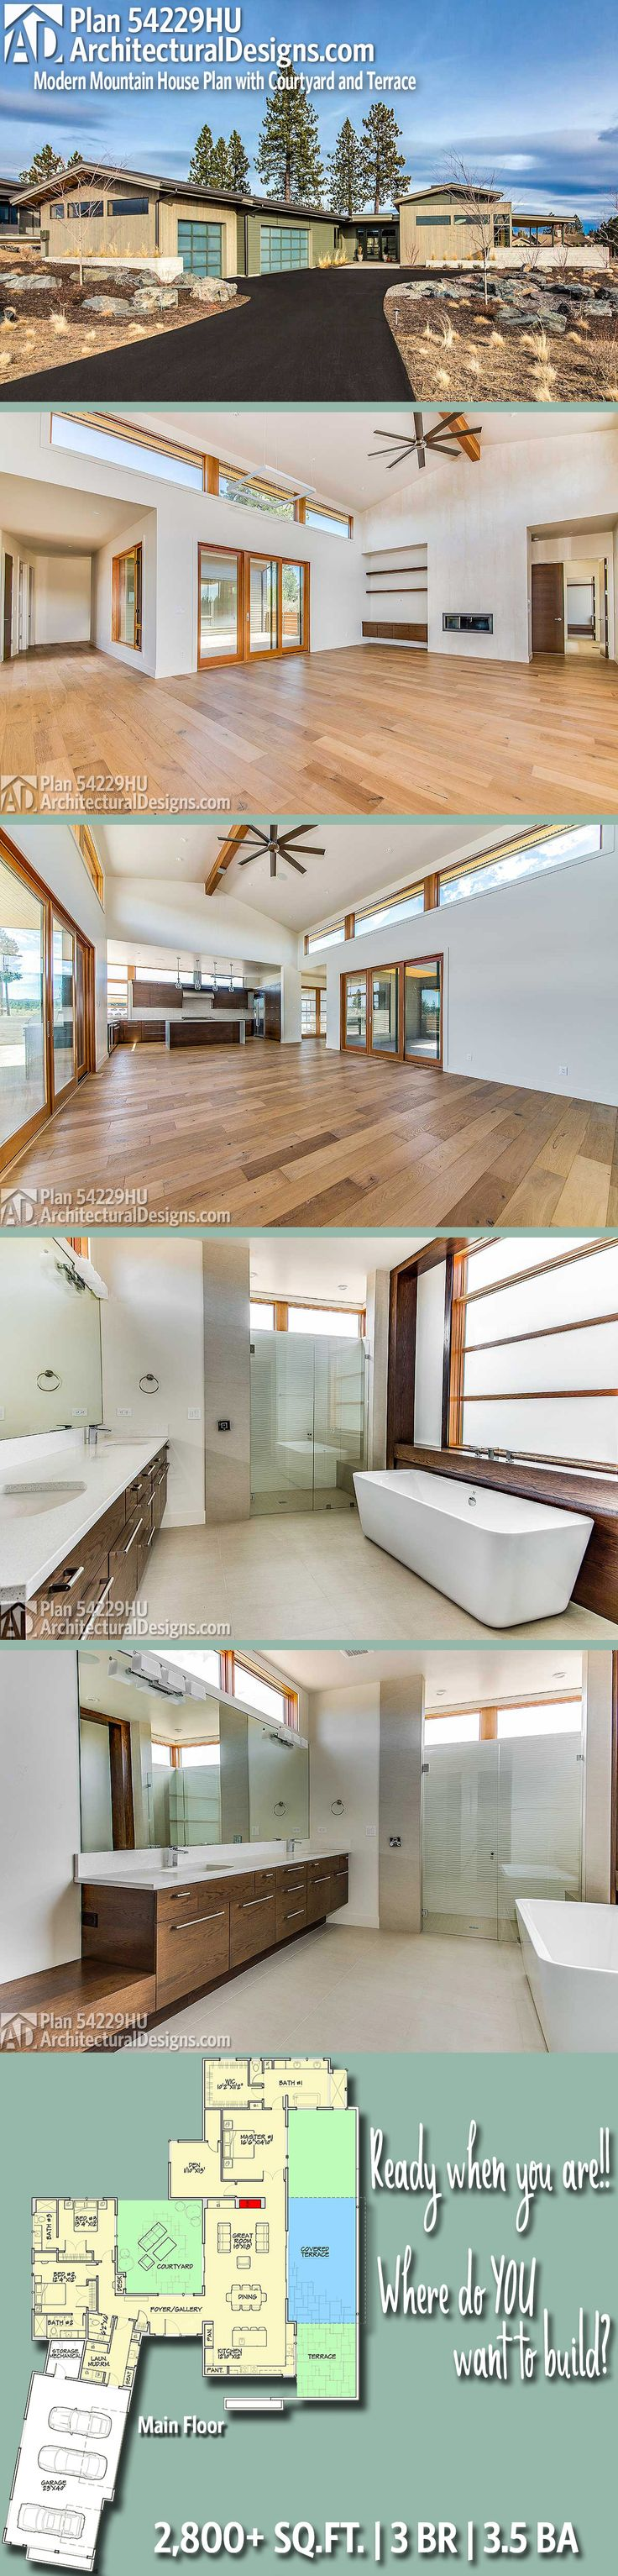 Architectural Designs House Plan 54229HU | 3BR | 3.5BA | 2,800+ Sq.Ft.